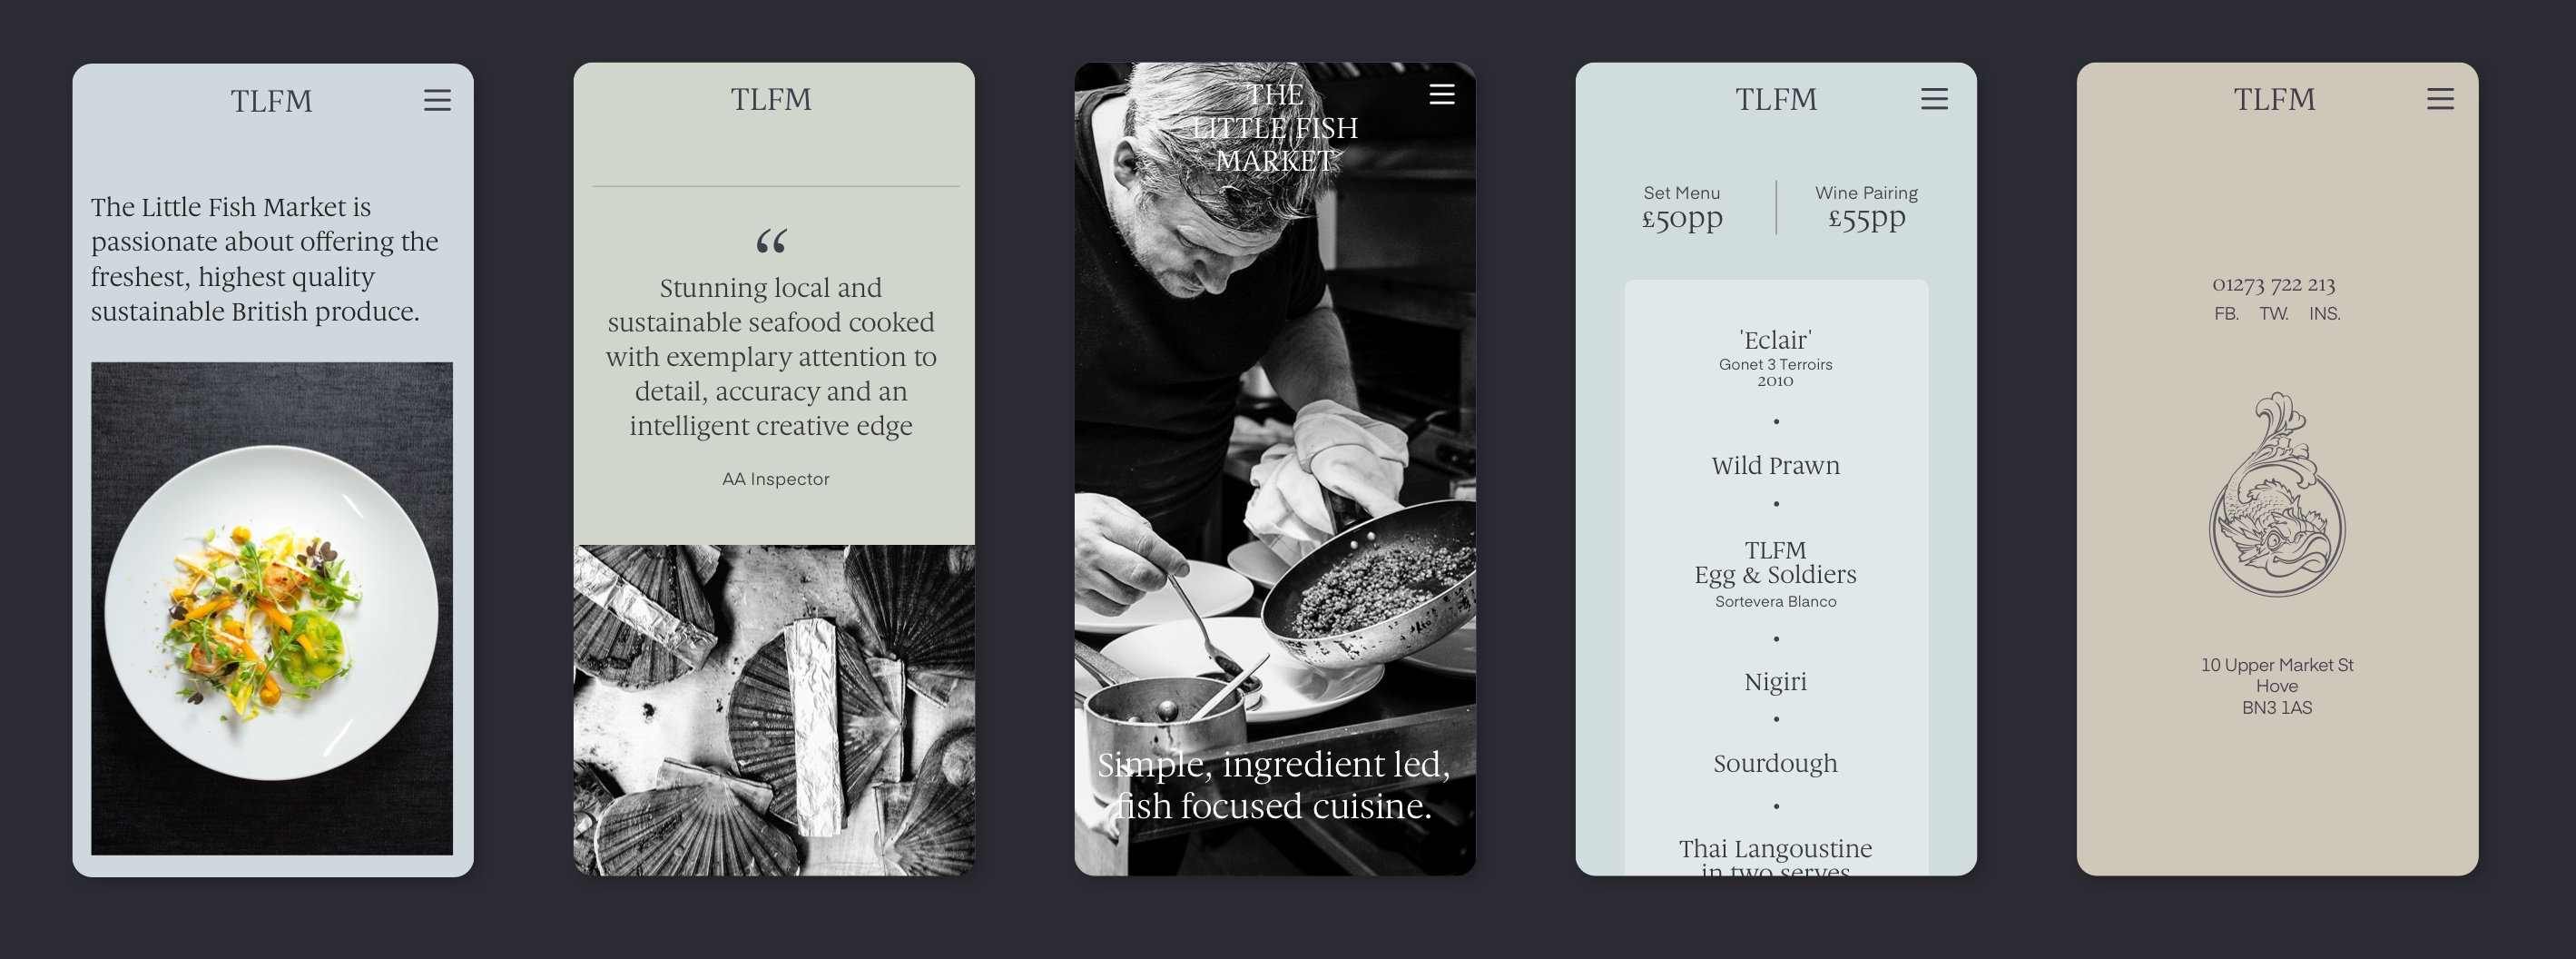 The Little Fish Market - Mobile Website Design